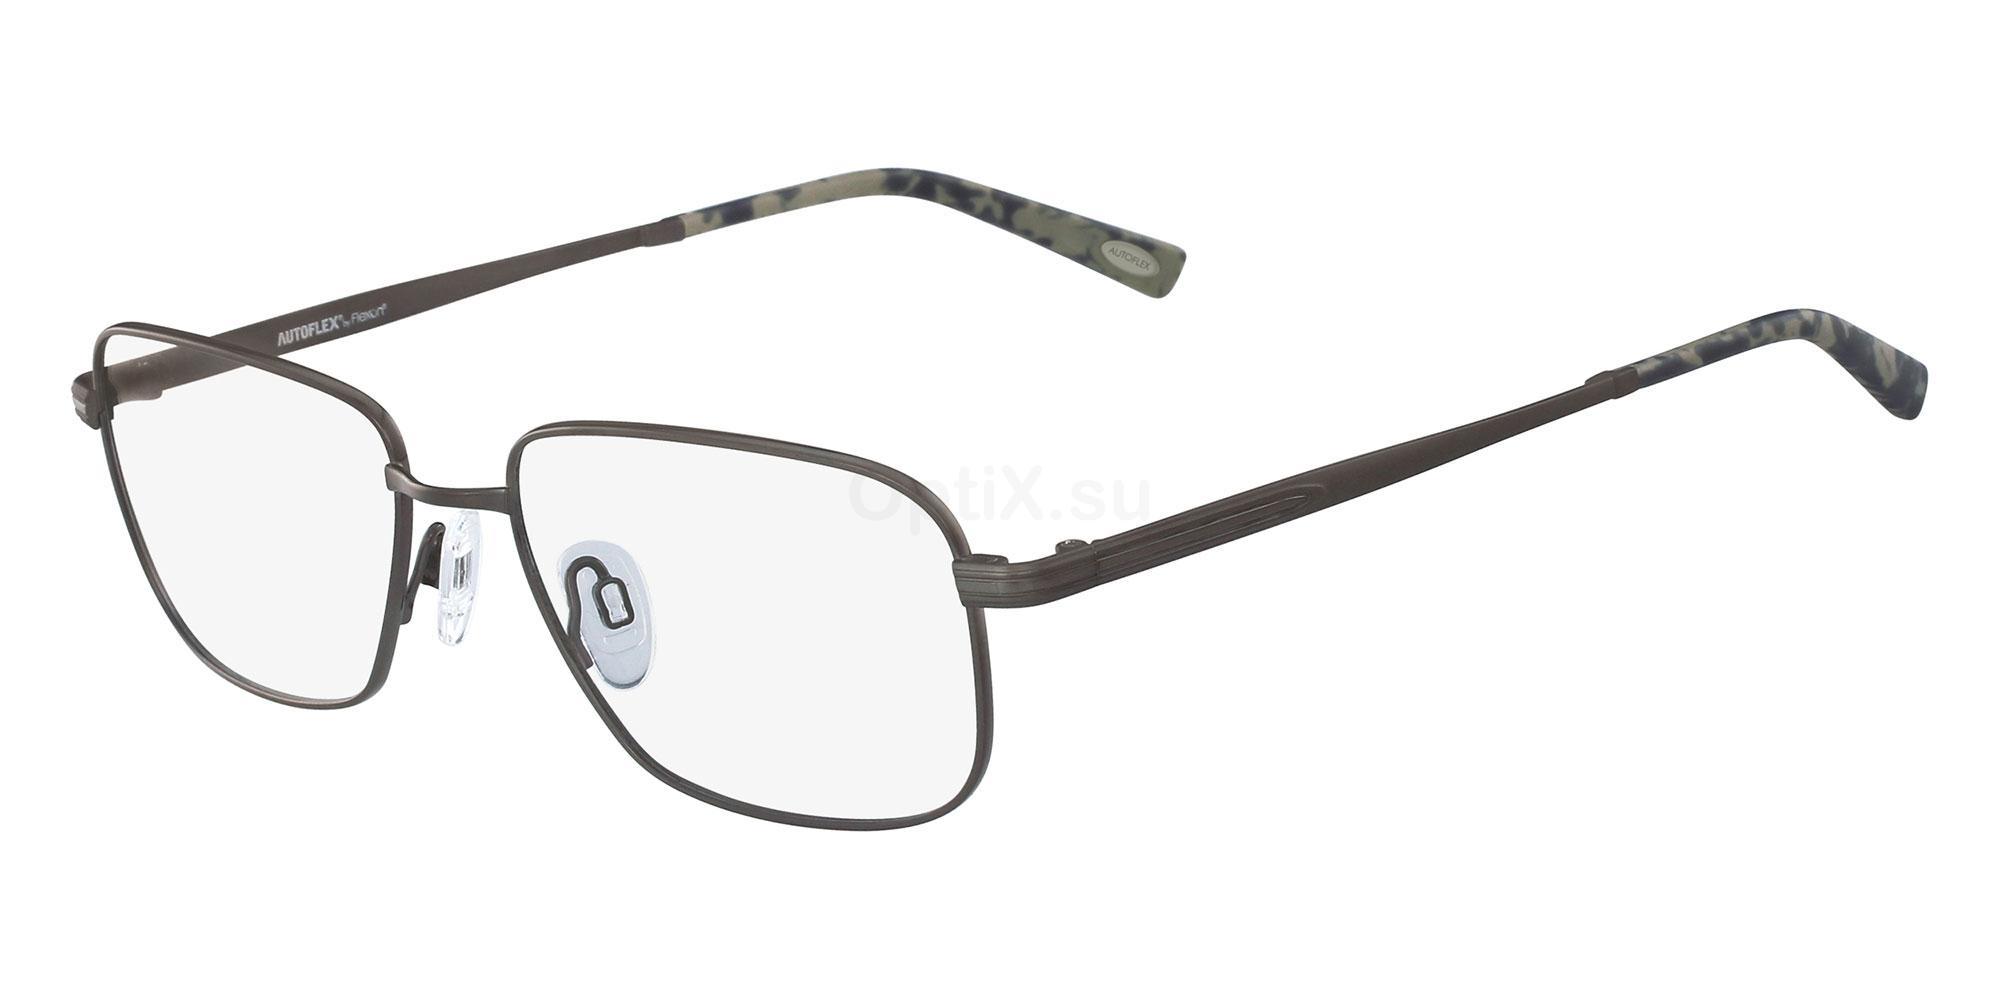 033 AUTOFLEX 101 Glasses, Flexon